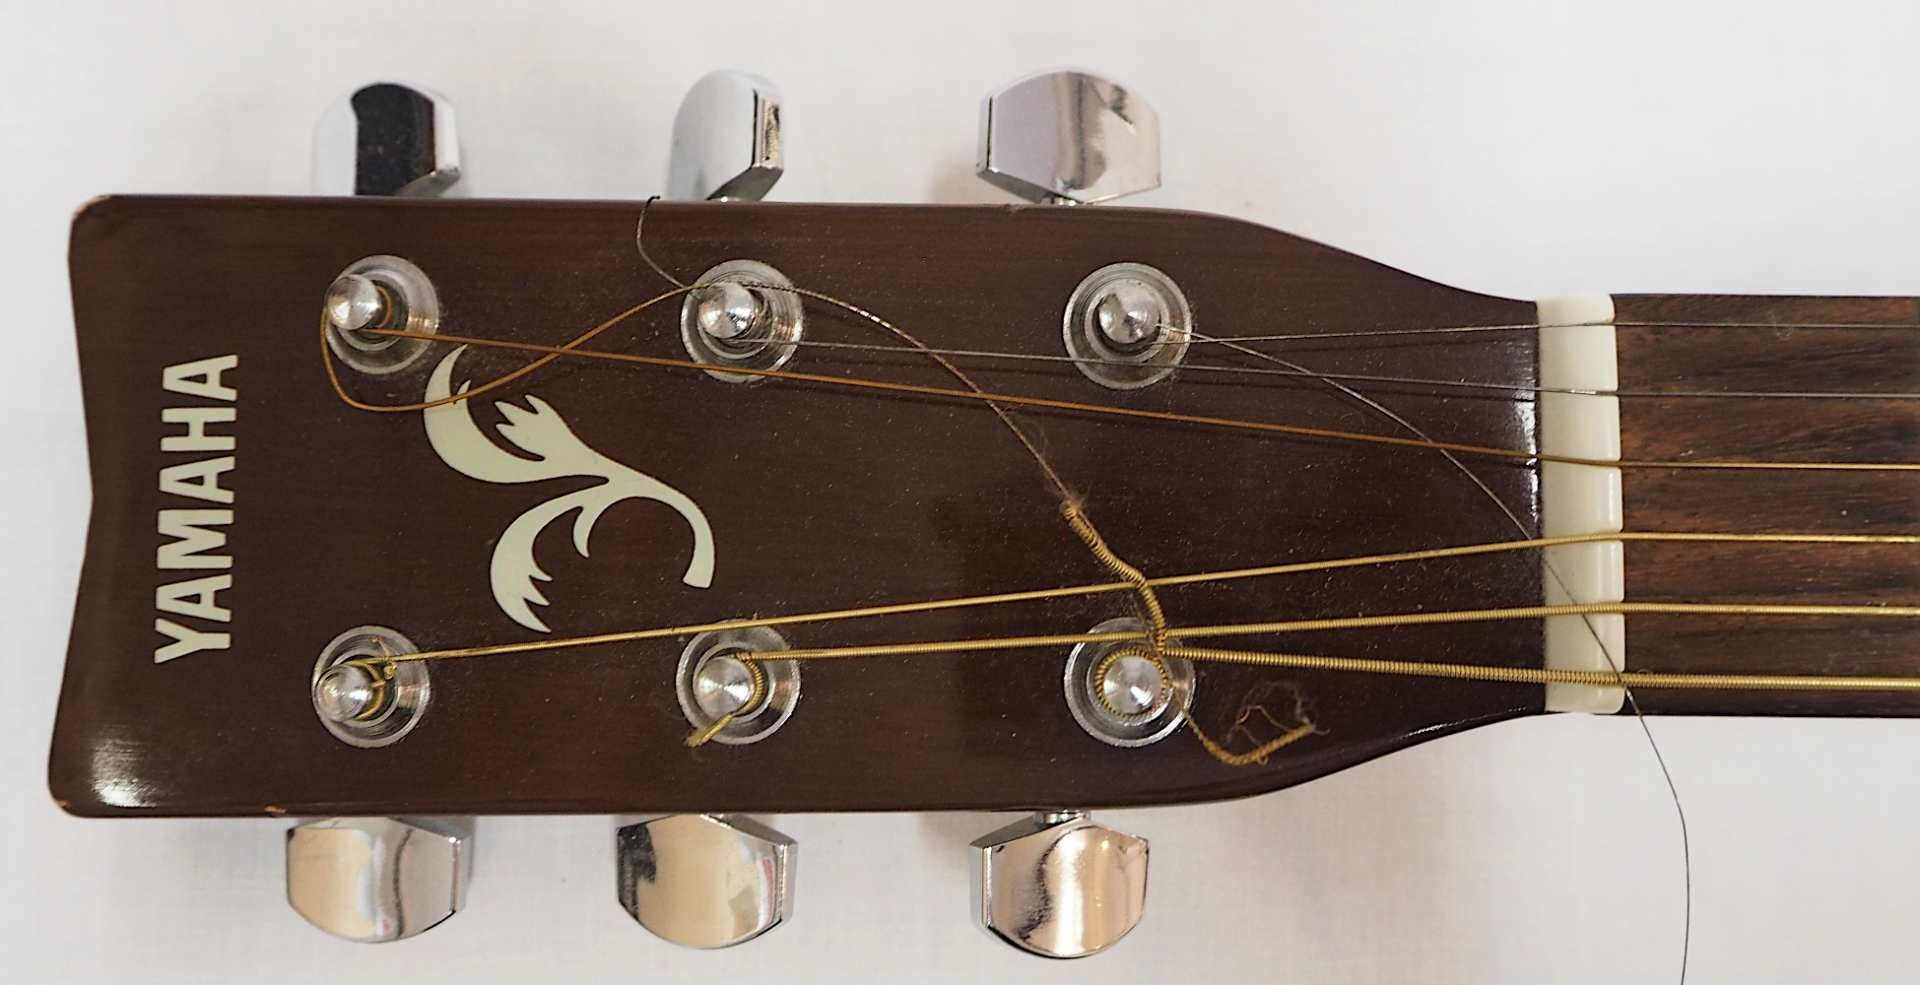 "1 Westerngitarre YAMAHA Modell: ""F-310P TBS, YMMJ Co. Ldt.,"" Indonesien Holzkorpus mit - Bild 3 aus 6"